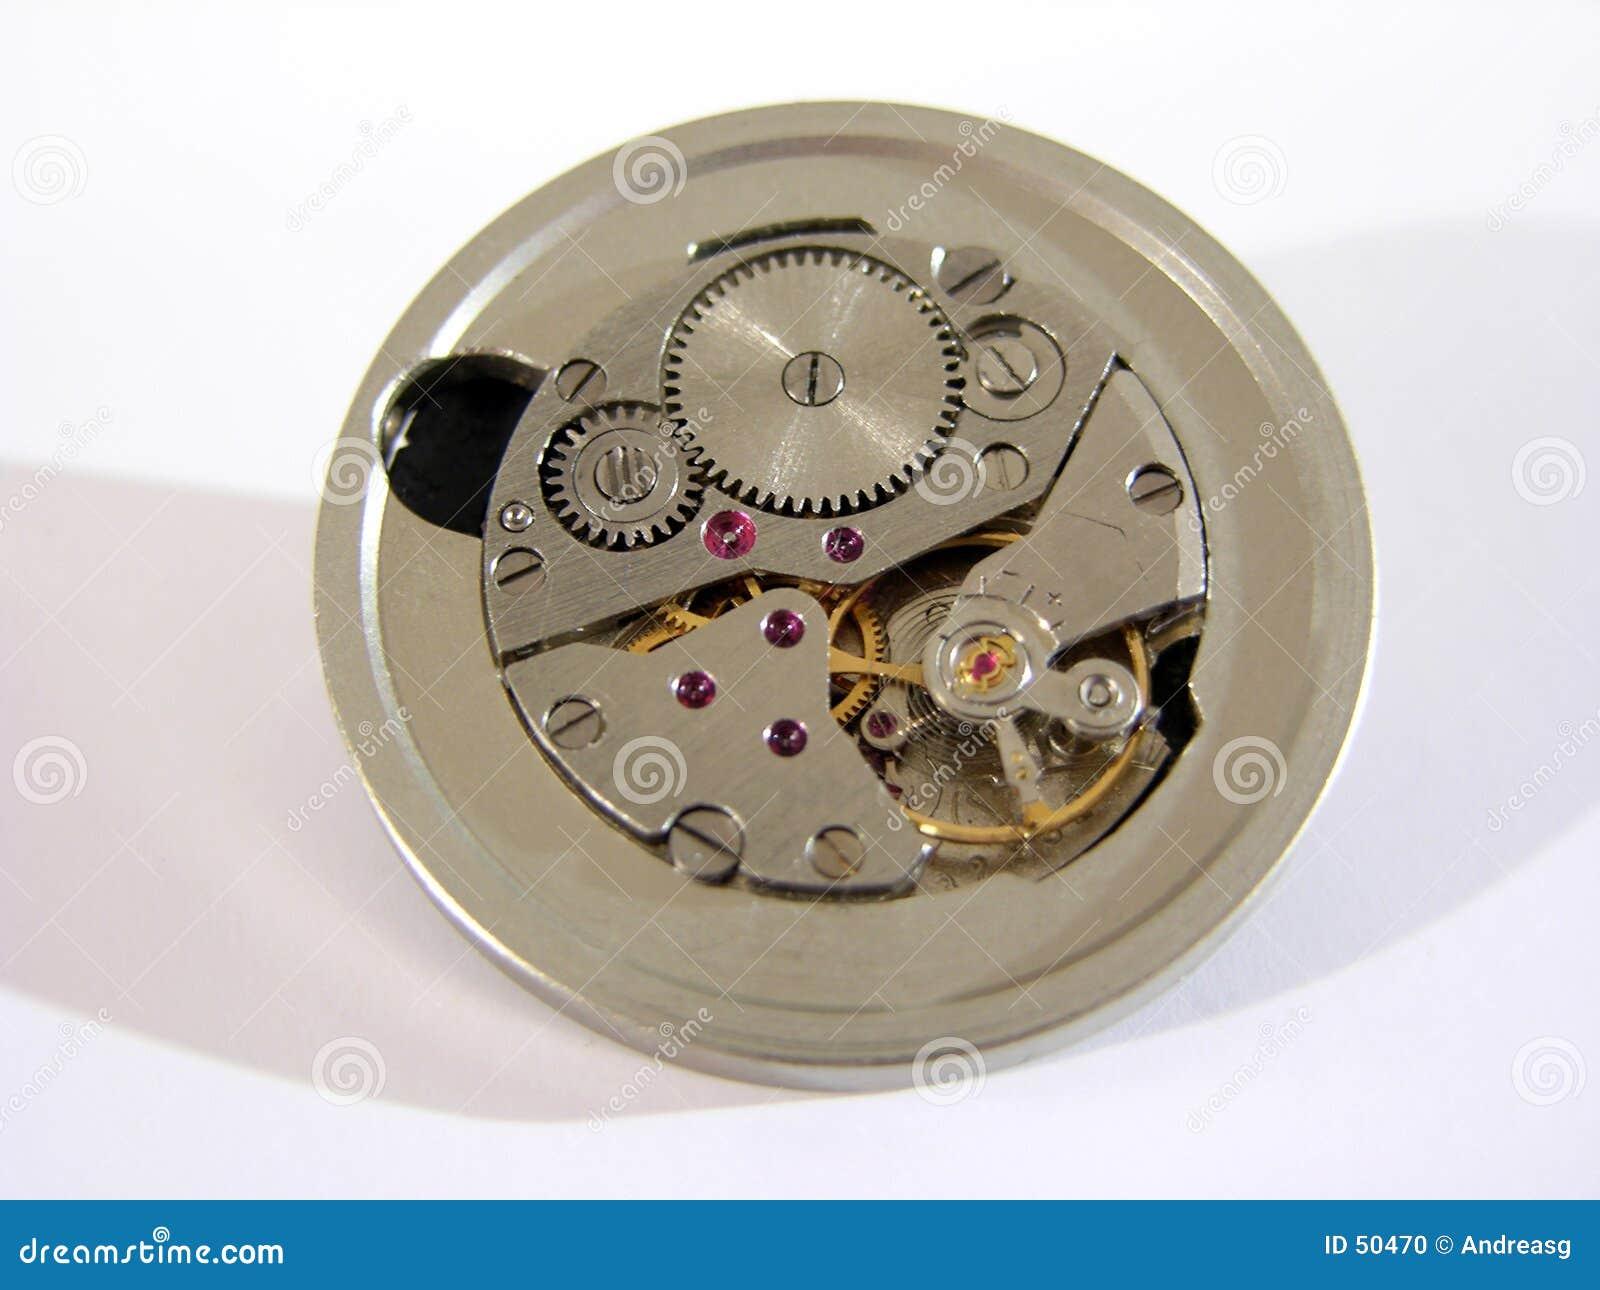 Download Mécanisme d'horloge photo stock. Image du programme, bijoux - 50470